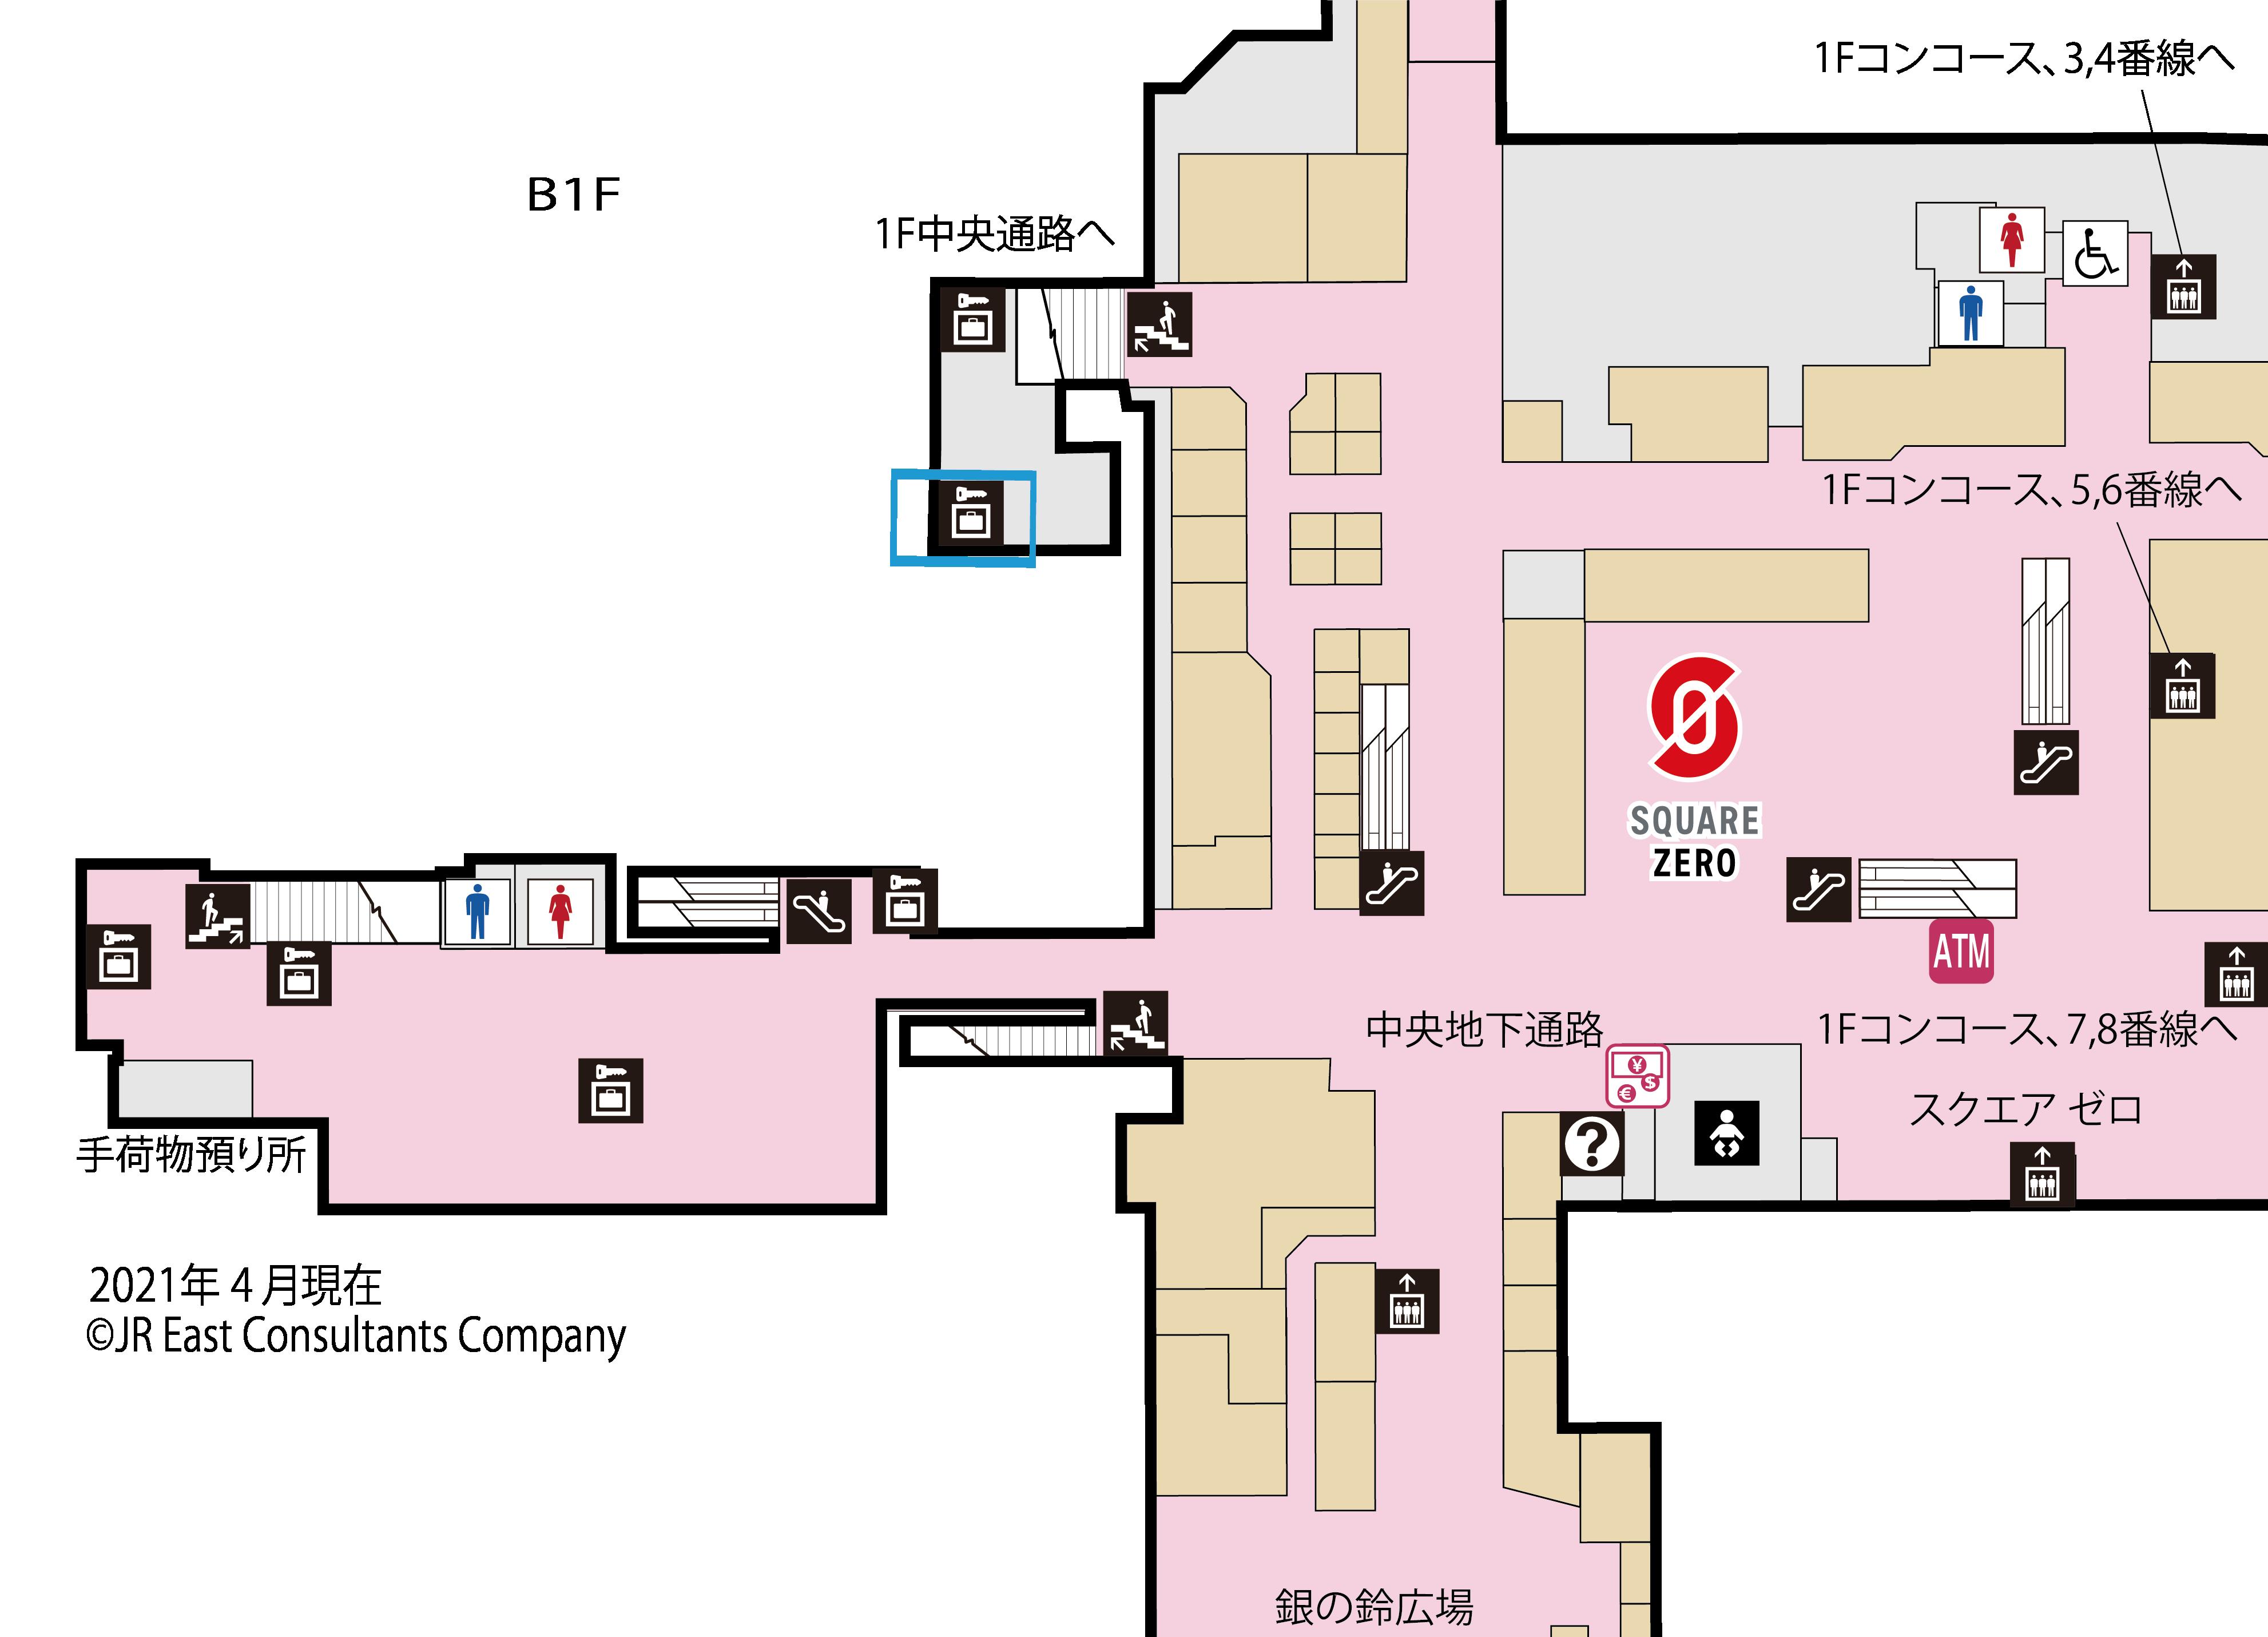 地下1階階段踊り場